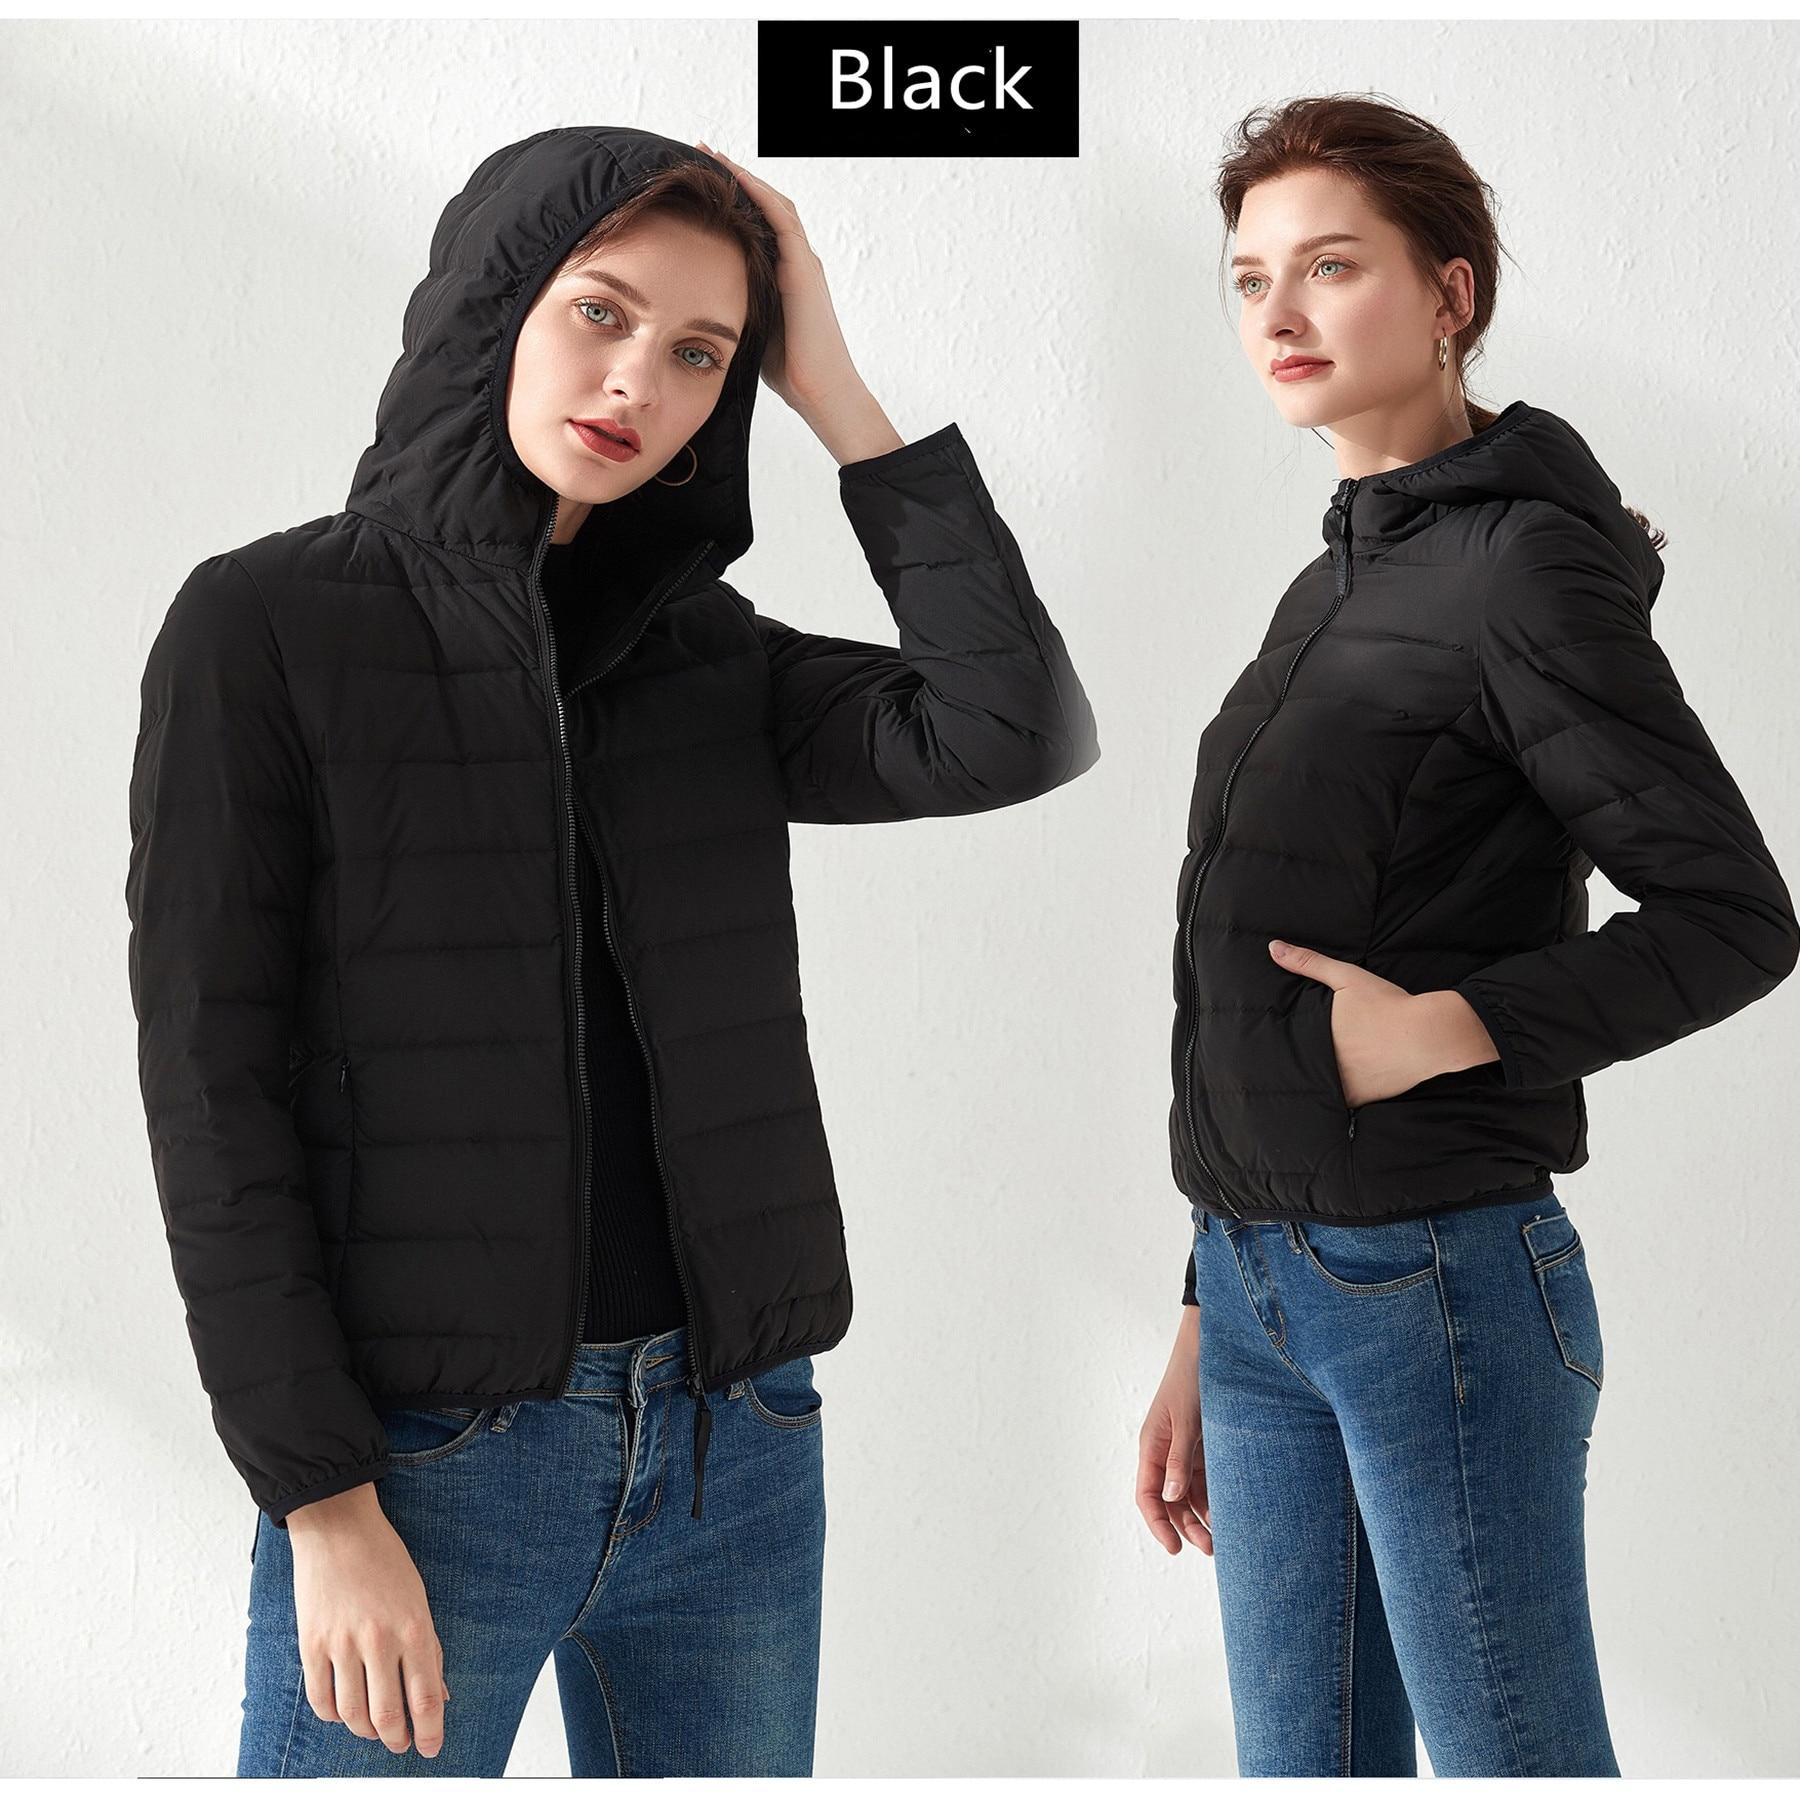 Seamless one autumn and winter lightweight down jacket women's short hooded lightweight outdoor women's thin white duck down